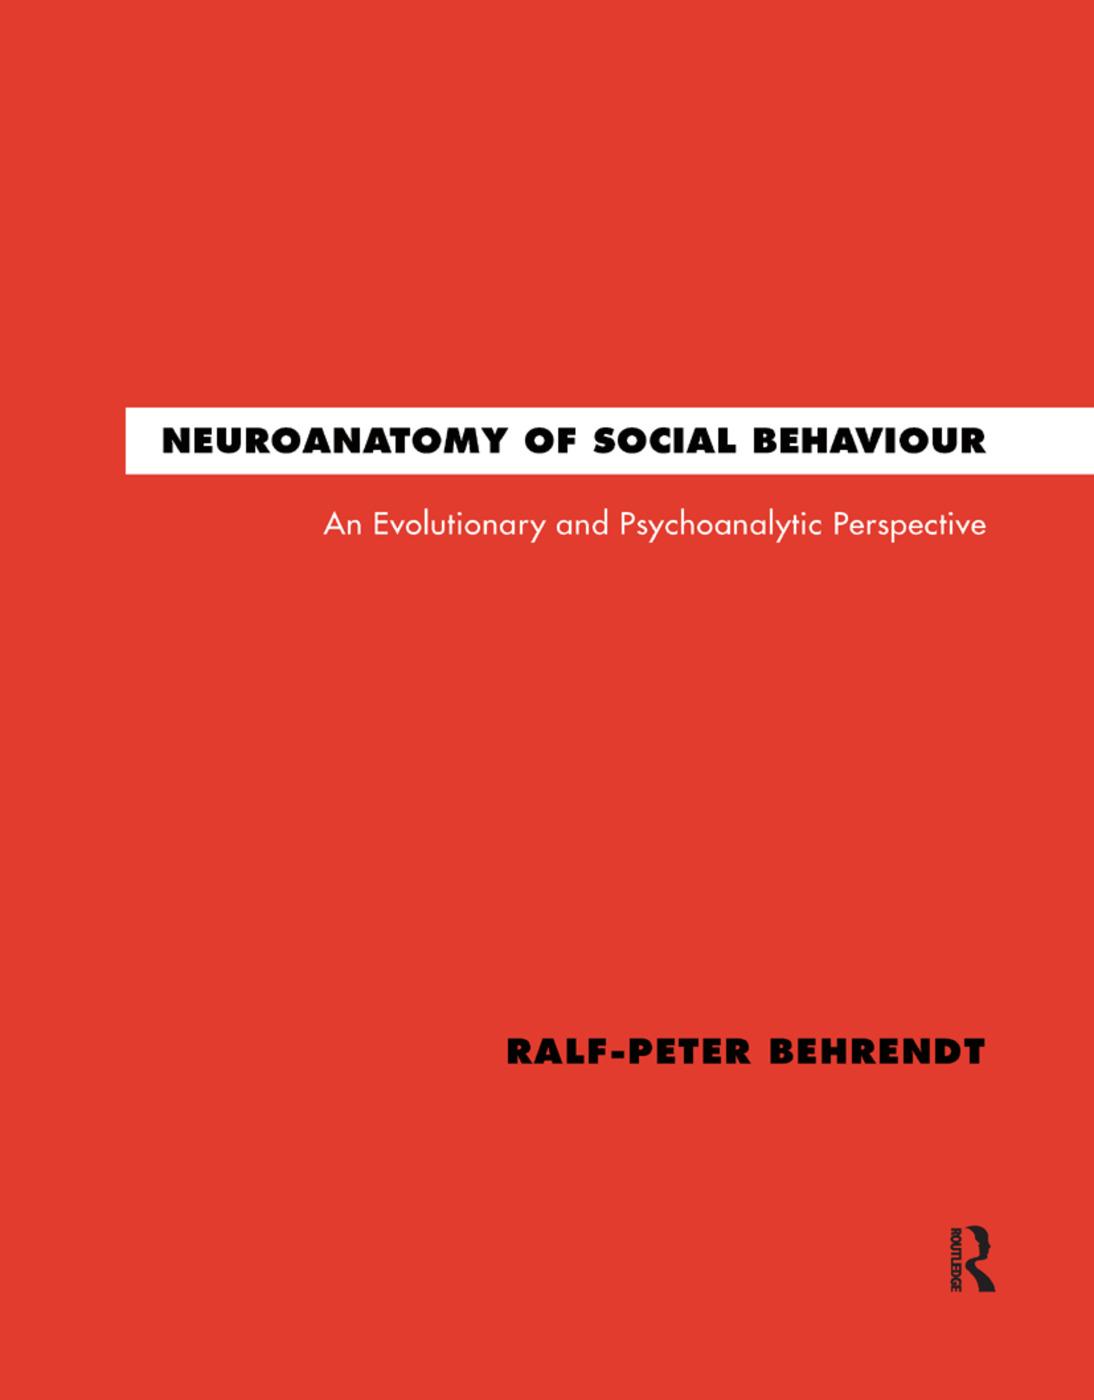 Neuroanatomy of Social Behaviour